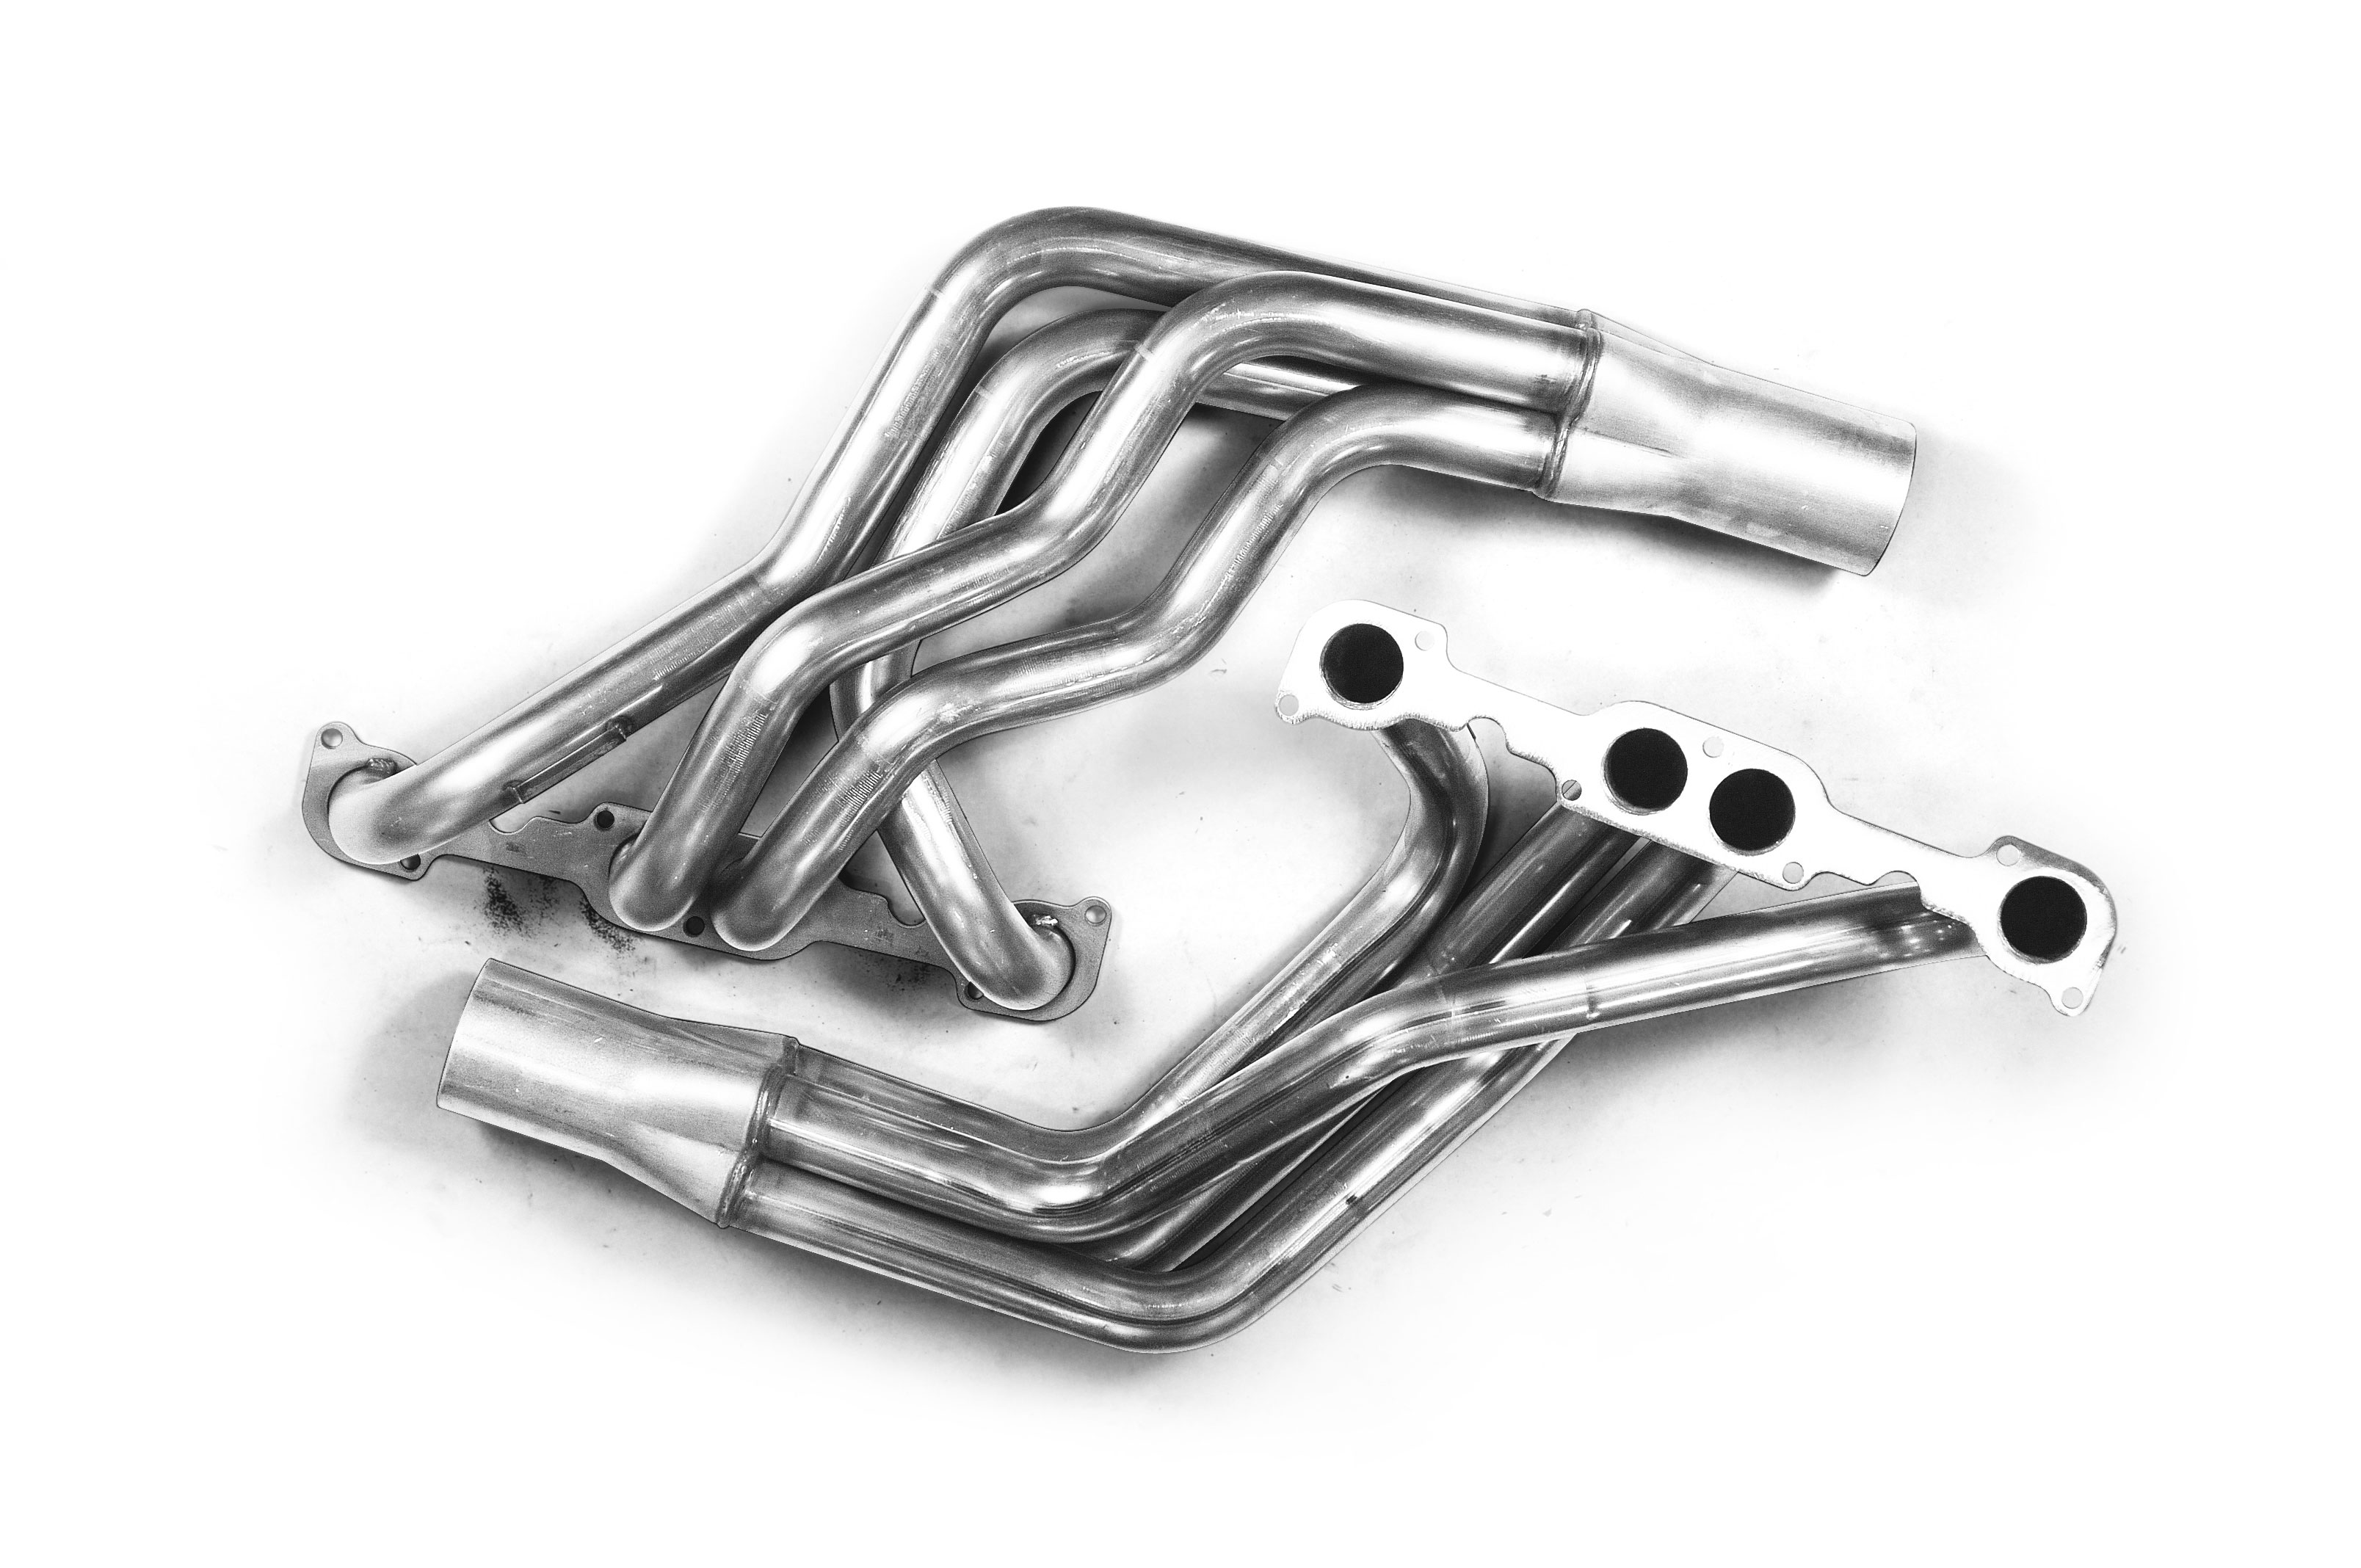 Mustang Bolt Pattern New Decorating Design